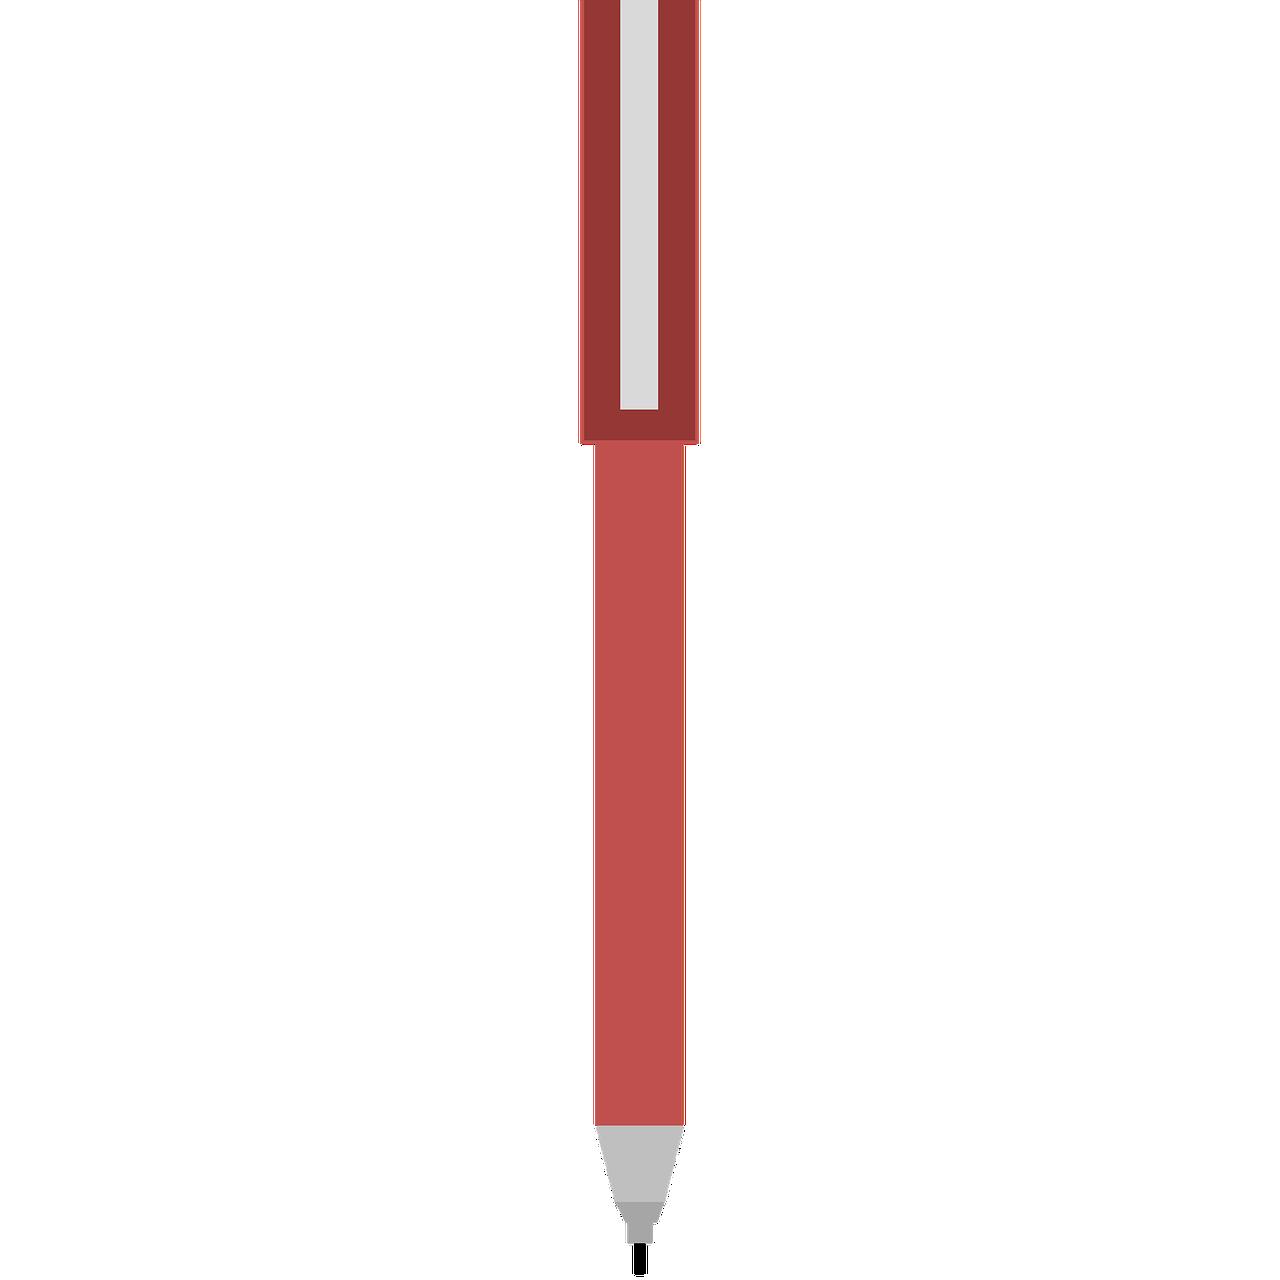 ballpoint pen clipart school free image on pixabay https creativecommons org licenses publicdomain